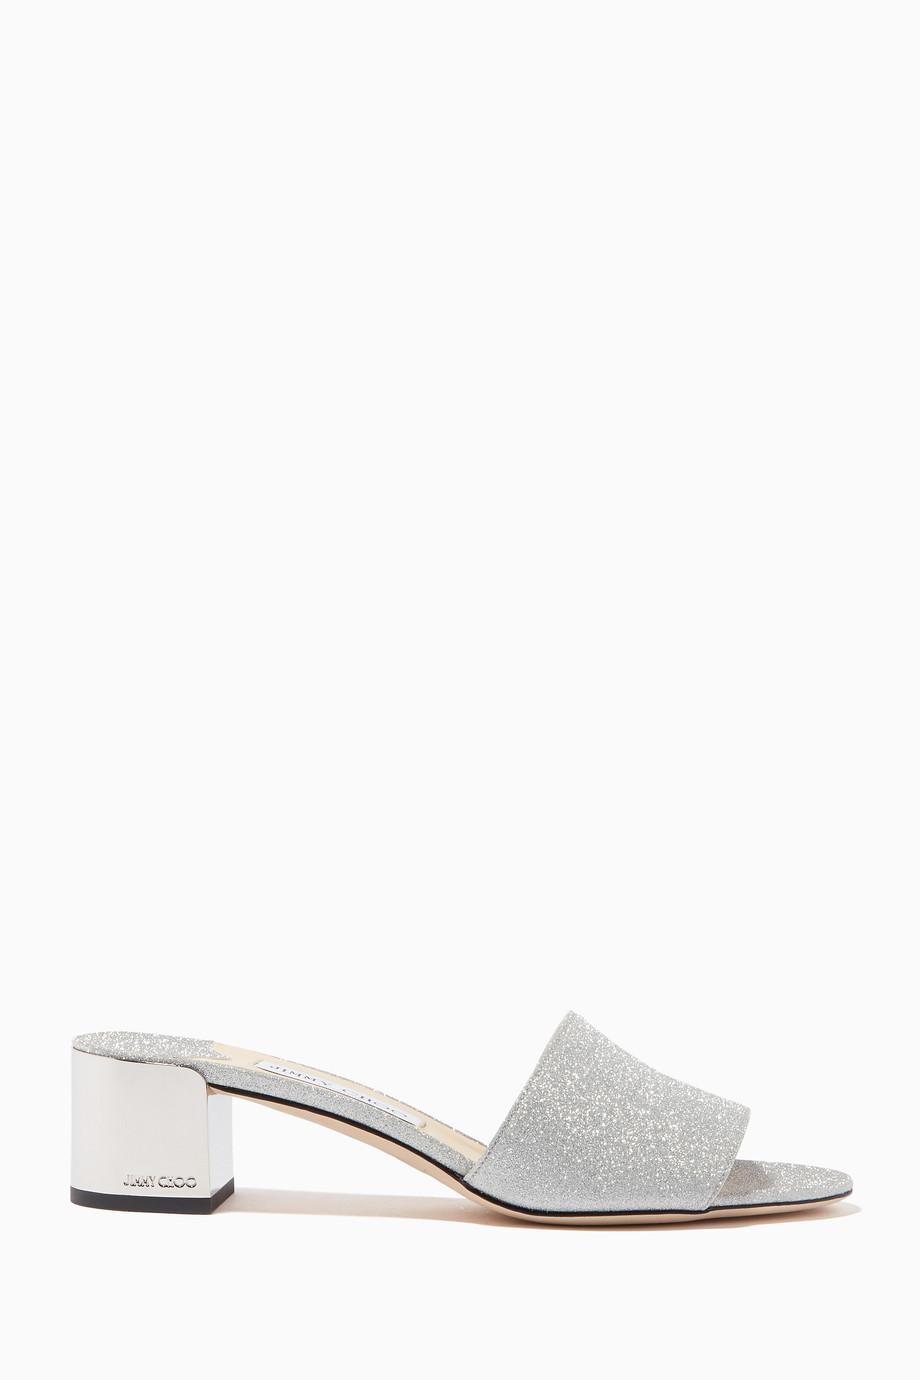 eafffaf0a2c Shop Jimmy Choo Silver Silver Joni Block-Heel Sandals for Women ...